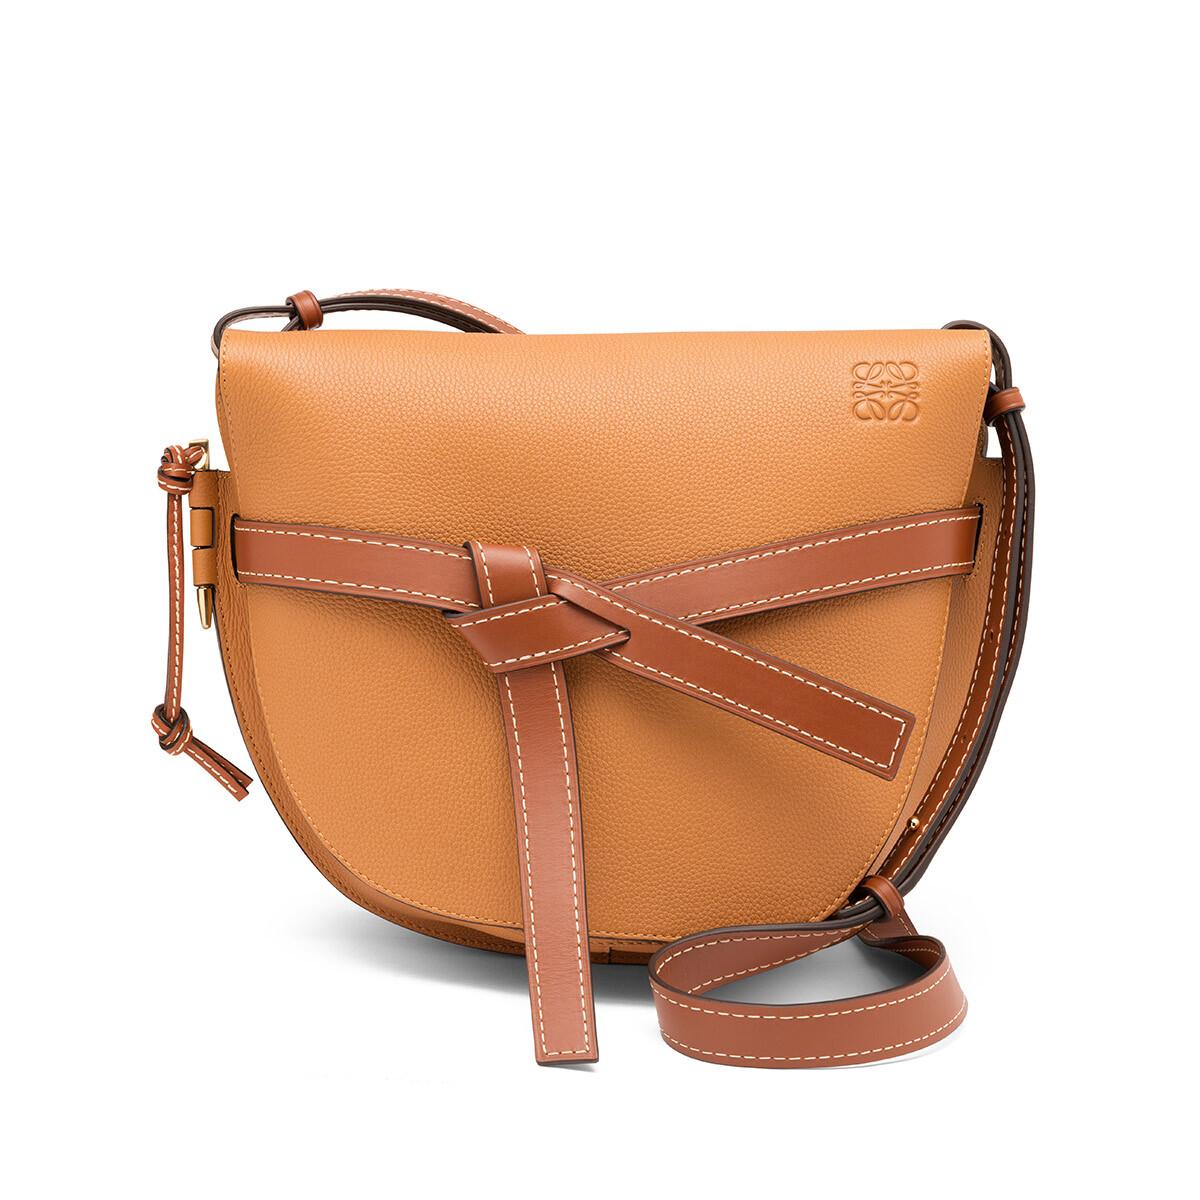 LOEWE Gate Bag Light Caramel/Pecan Color  front